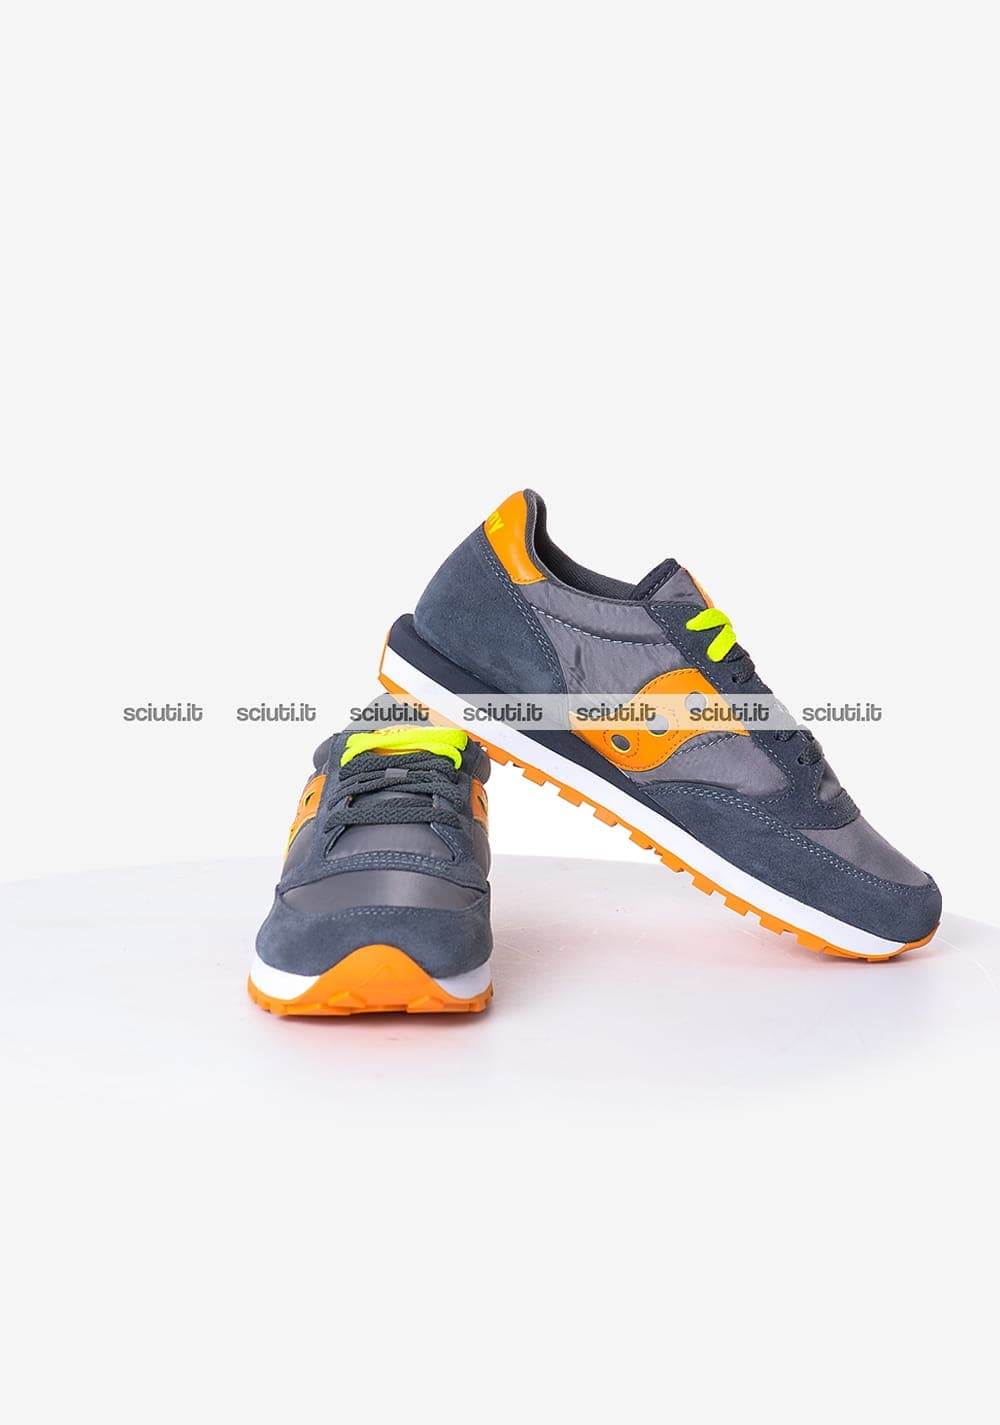 Scarpe Saucony uomo Jazz grigio scuro arancione | Sciuti.it